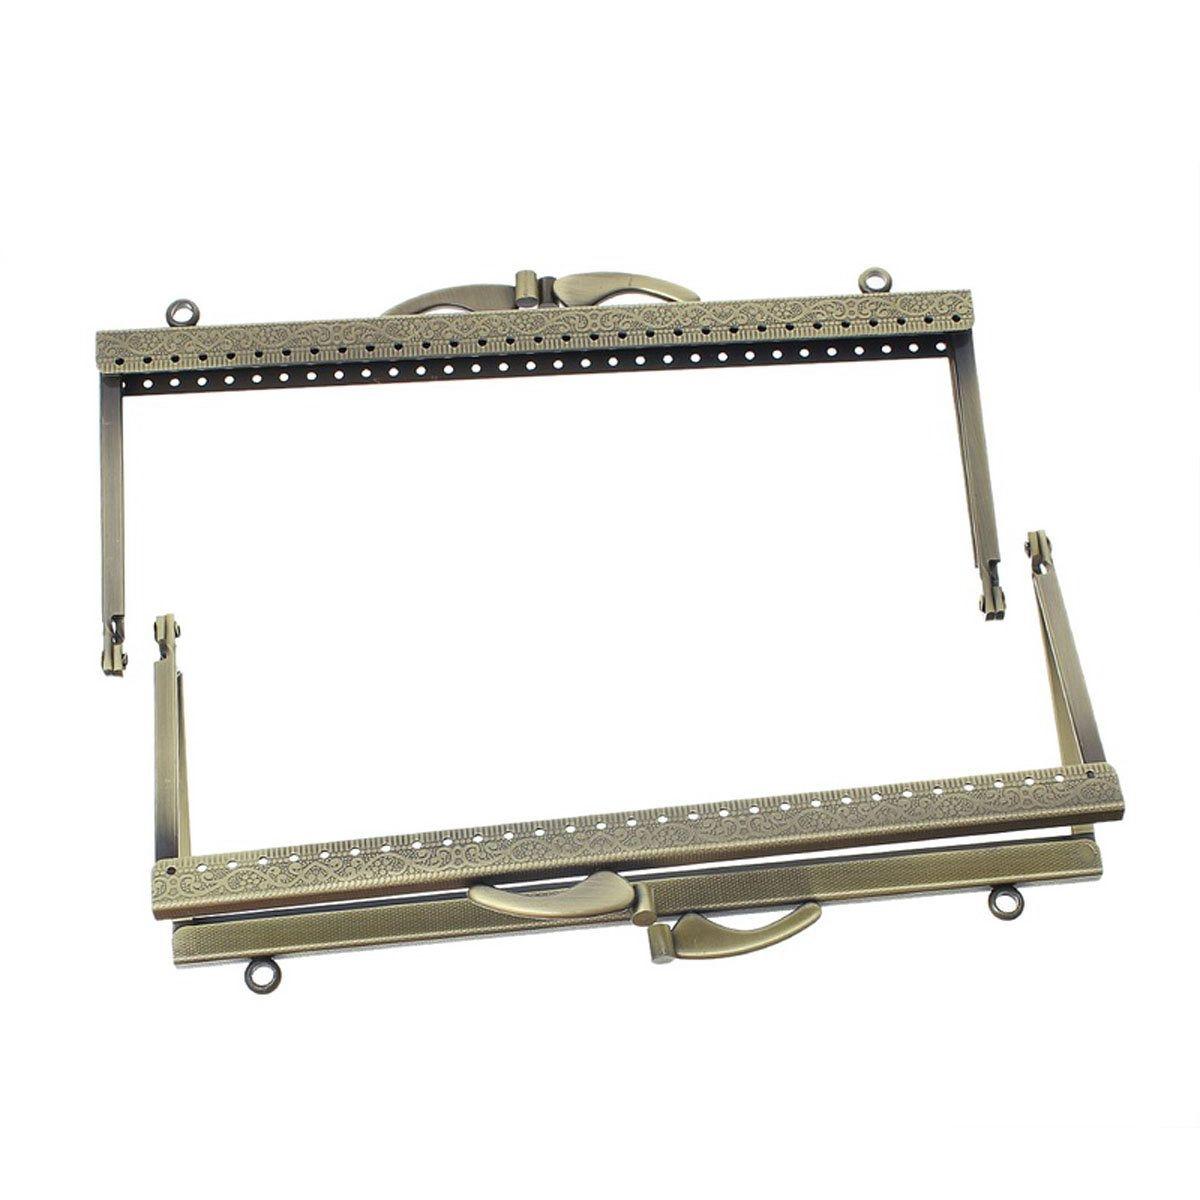 Metal Frame Kiss Clasp Arch For Purse Bag Bronze 19cm x 8.5cm